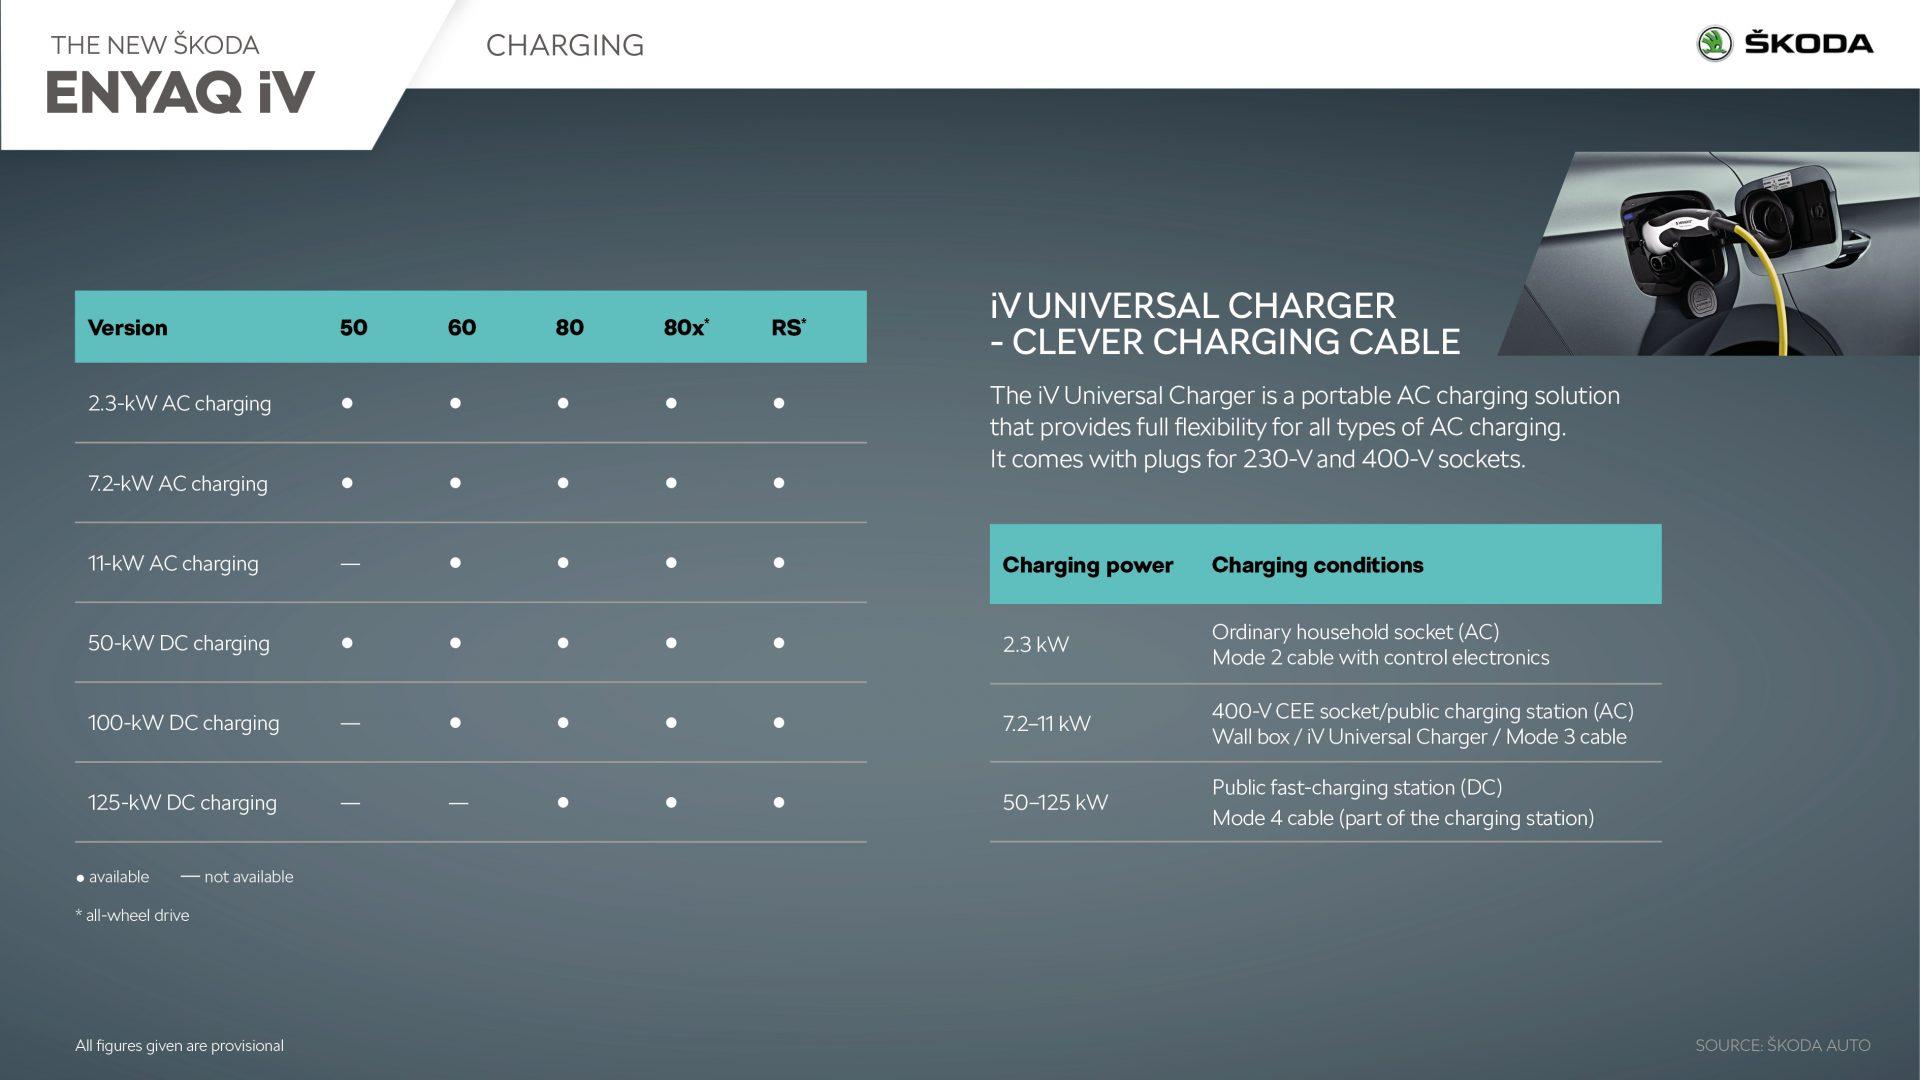 ENYAQ_iV_EN_Charging-1920x1080.jpg